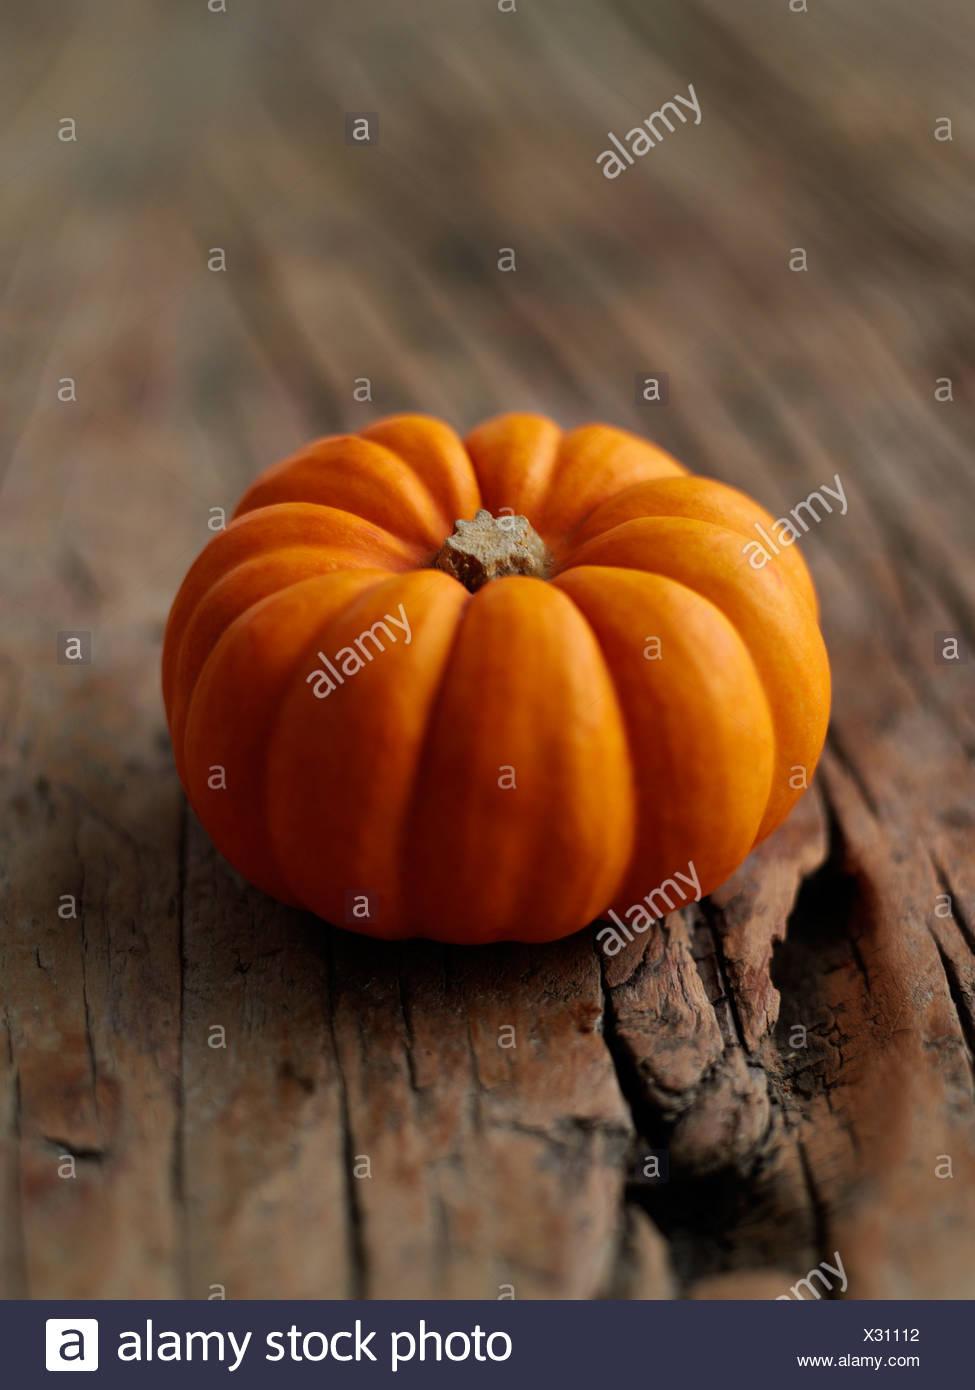 Munchkin Pumpkin - Stock Image